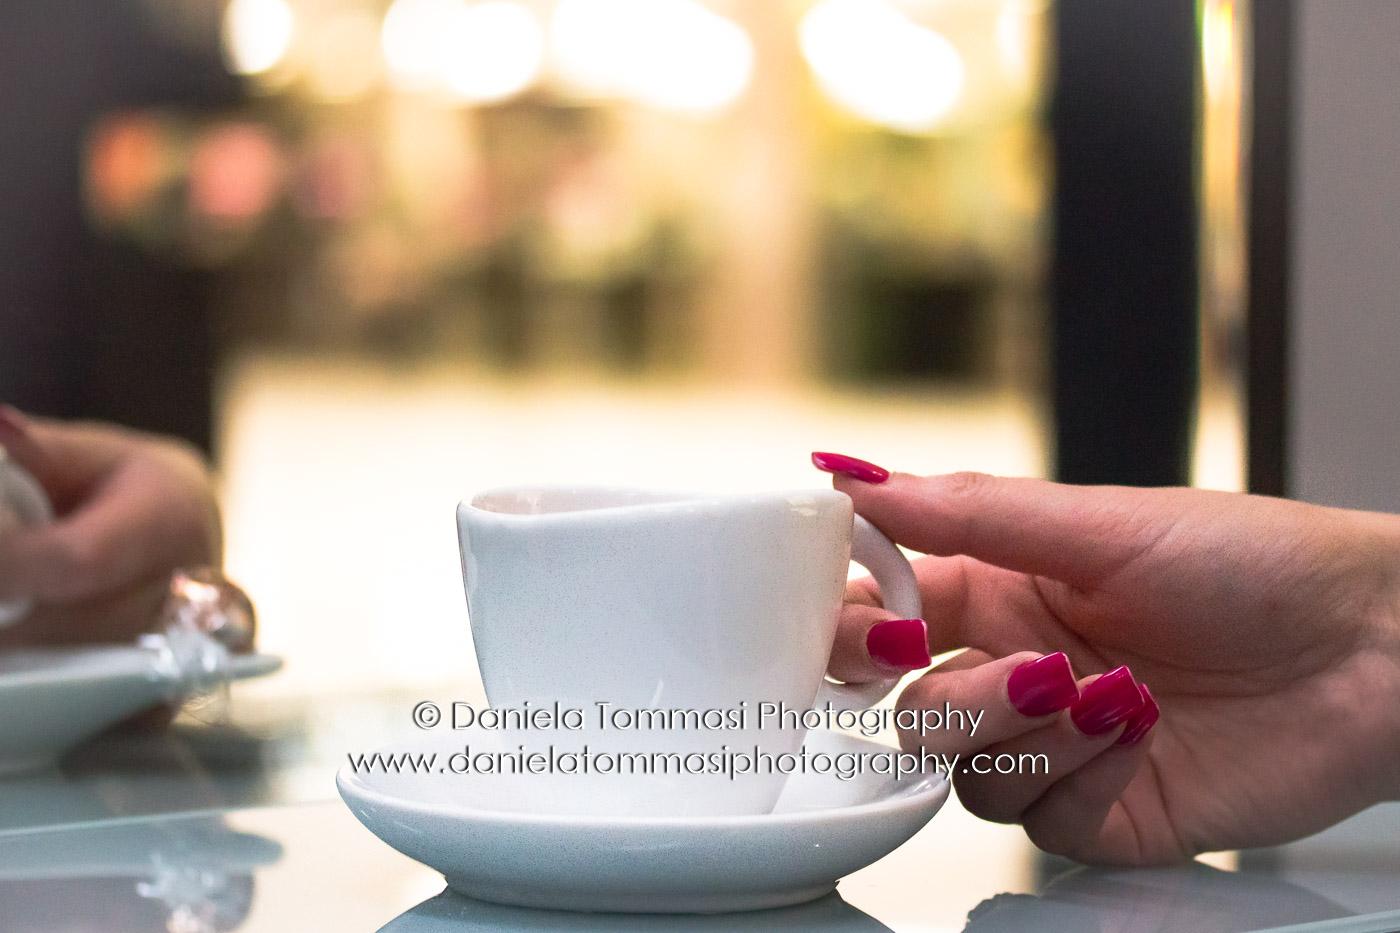 Restaurant-Daniela Tommasi Photography-1